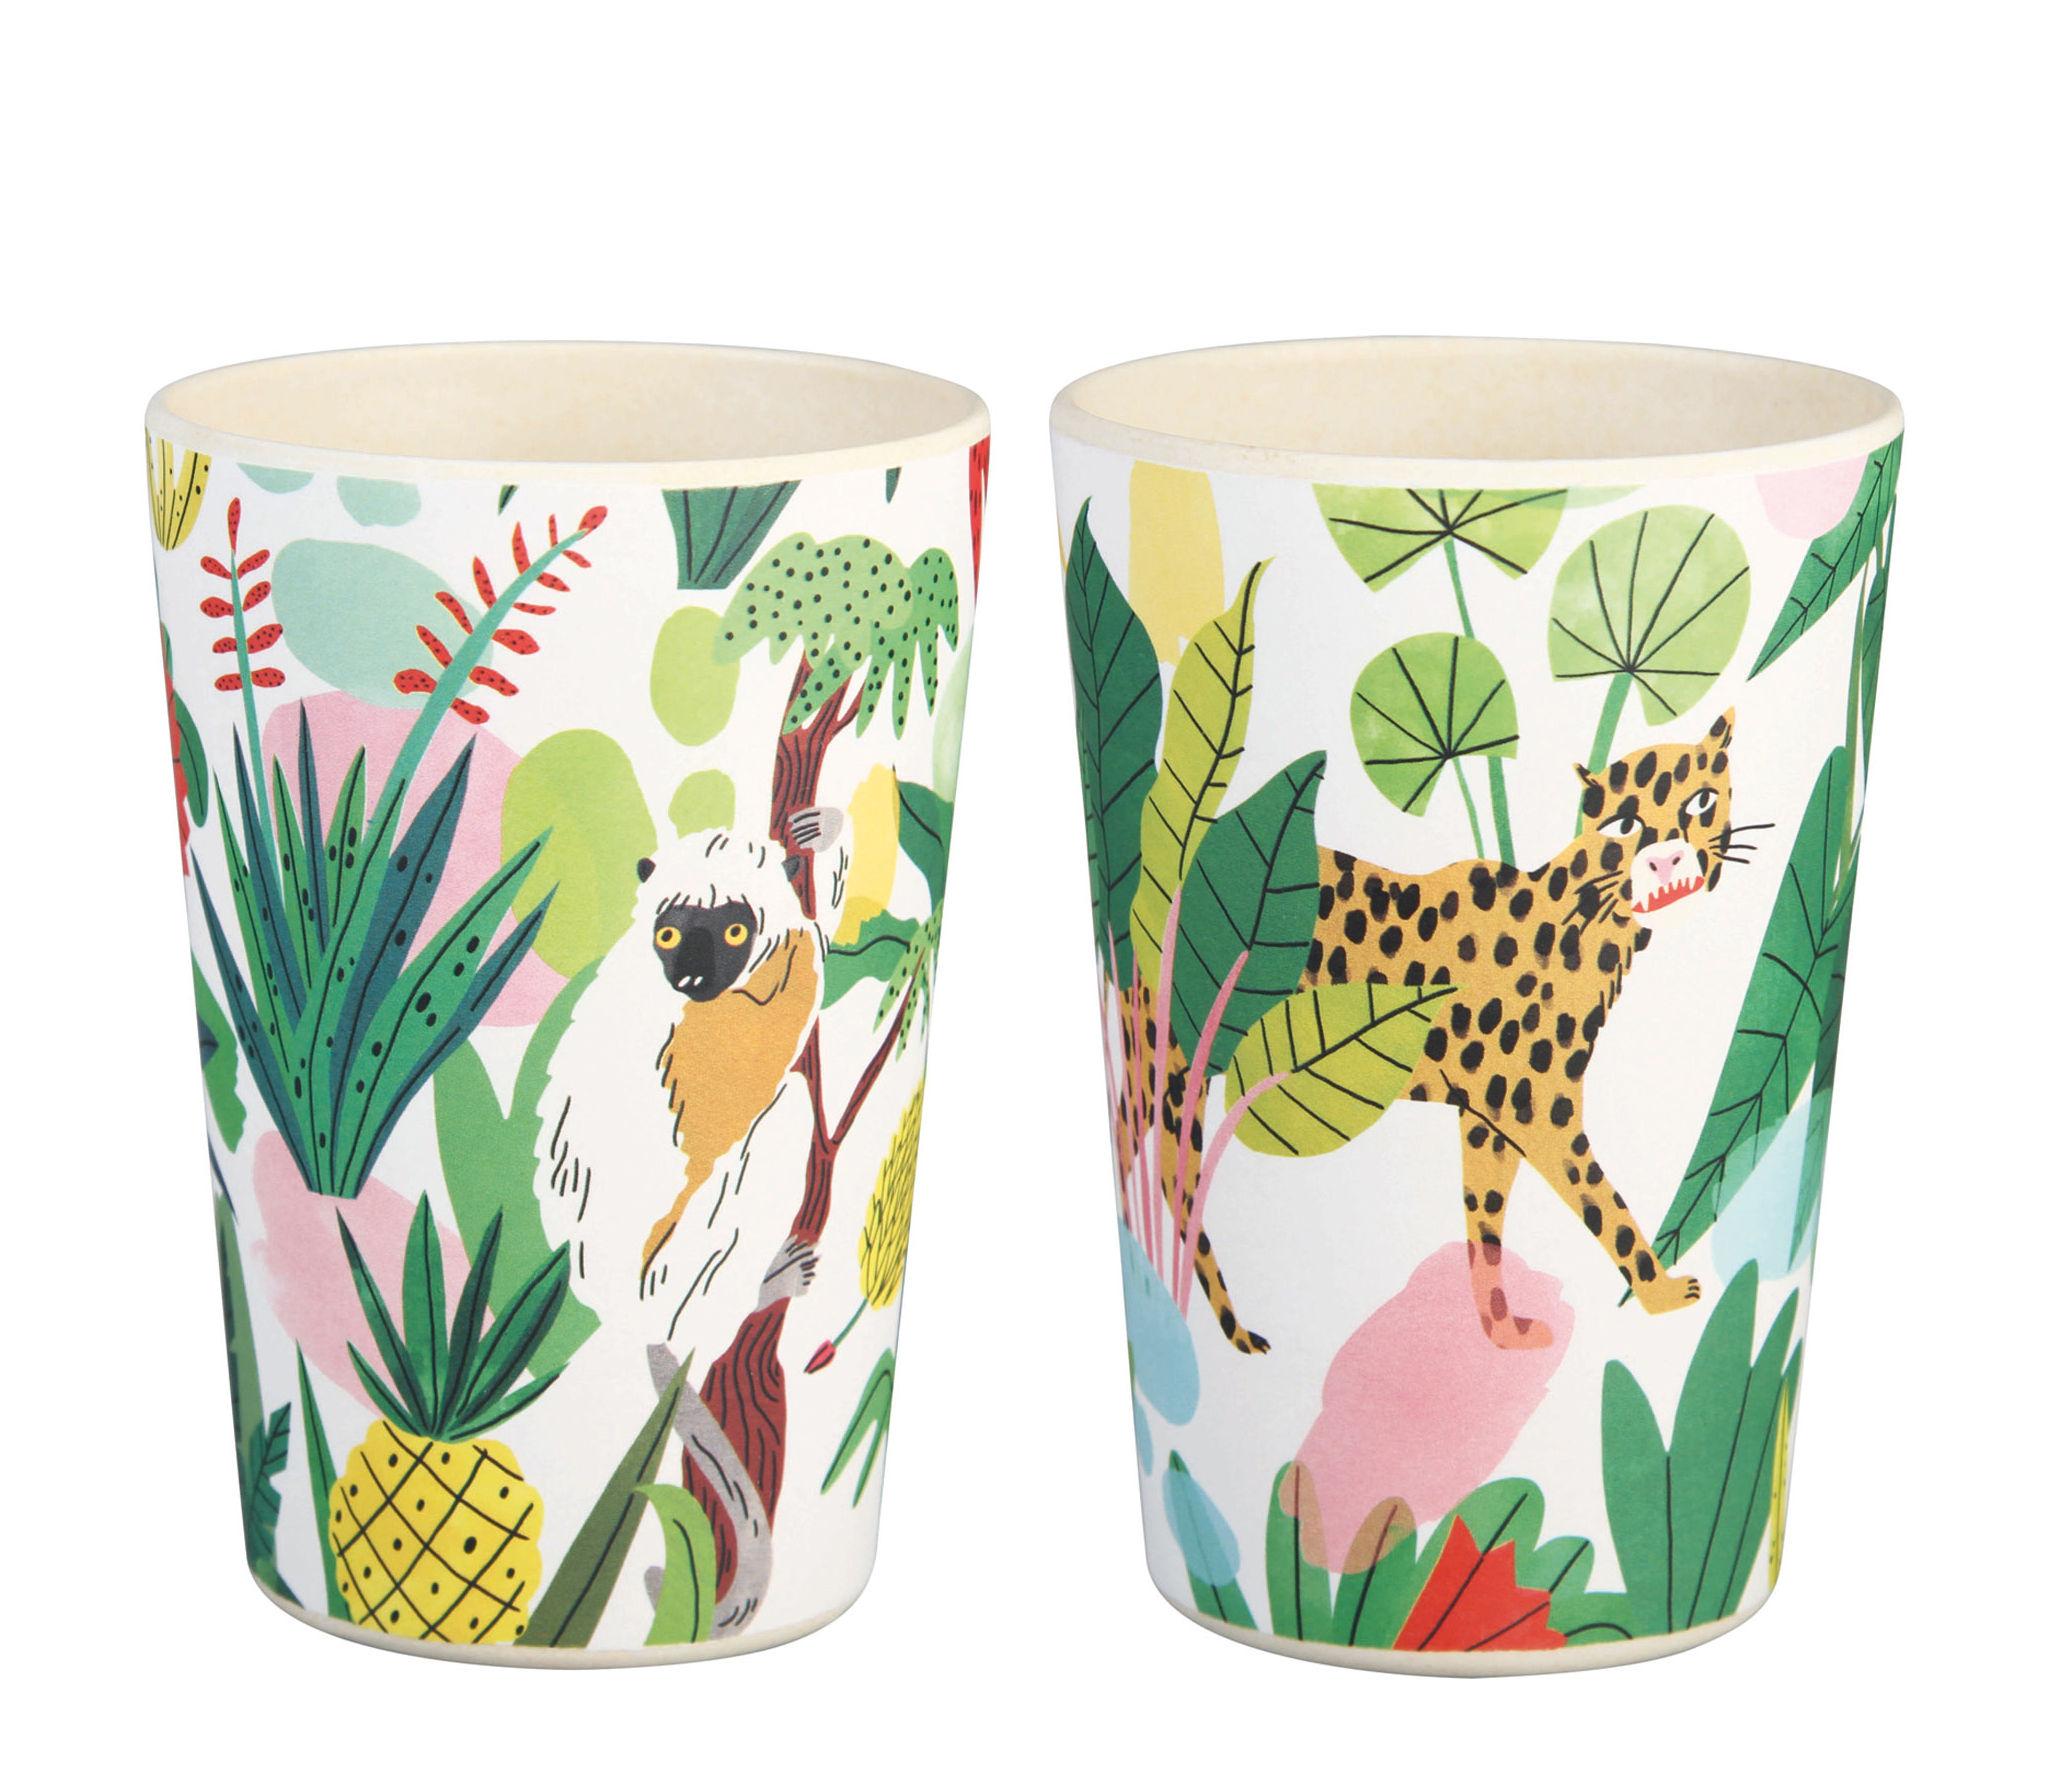 Tavola - Tazze e Boccali - Bicchiere/bicchierino Bodil - / Set da 2 - Bambù di & klevering - Giungla tropicale - Fibra di bambù